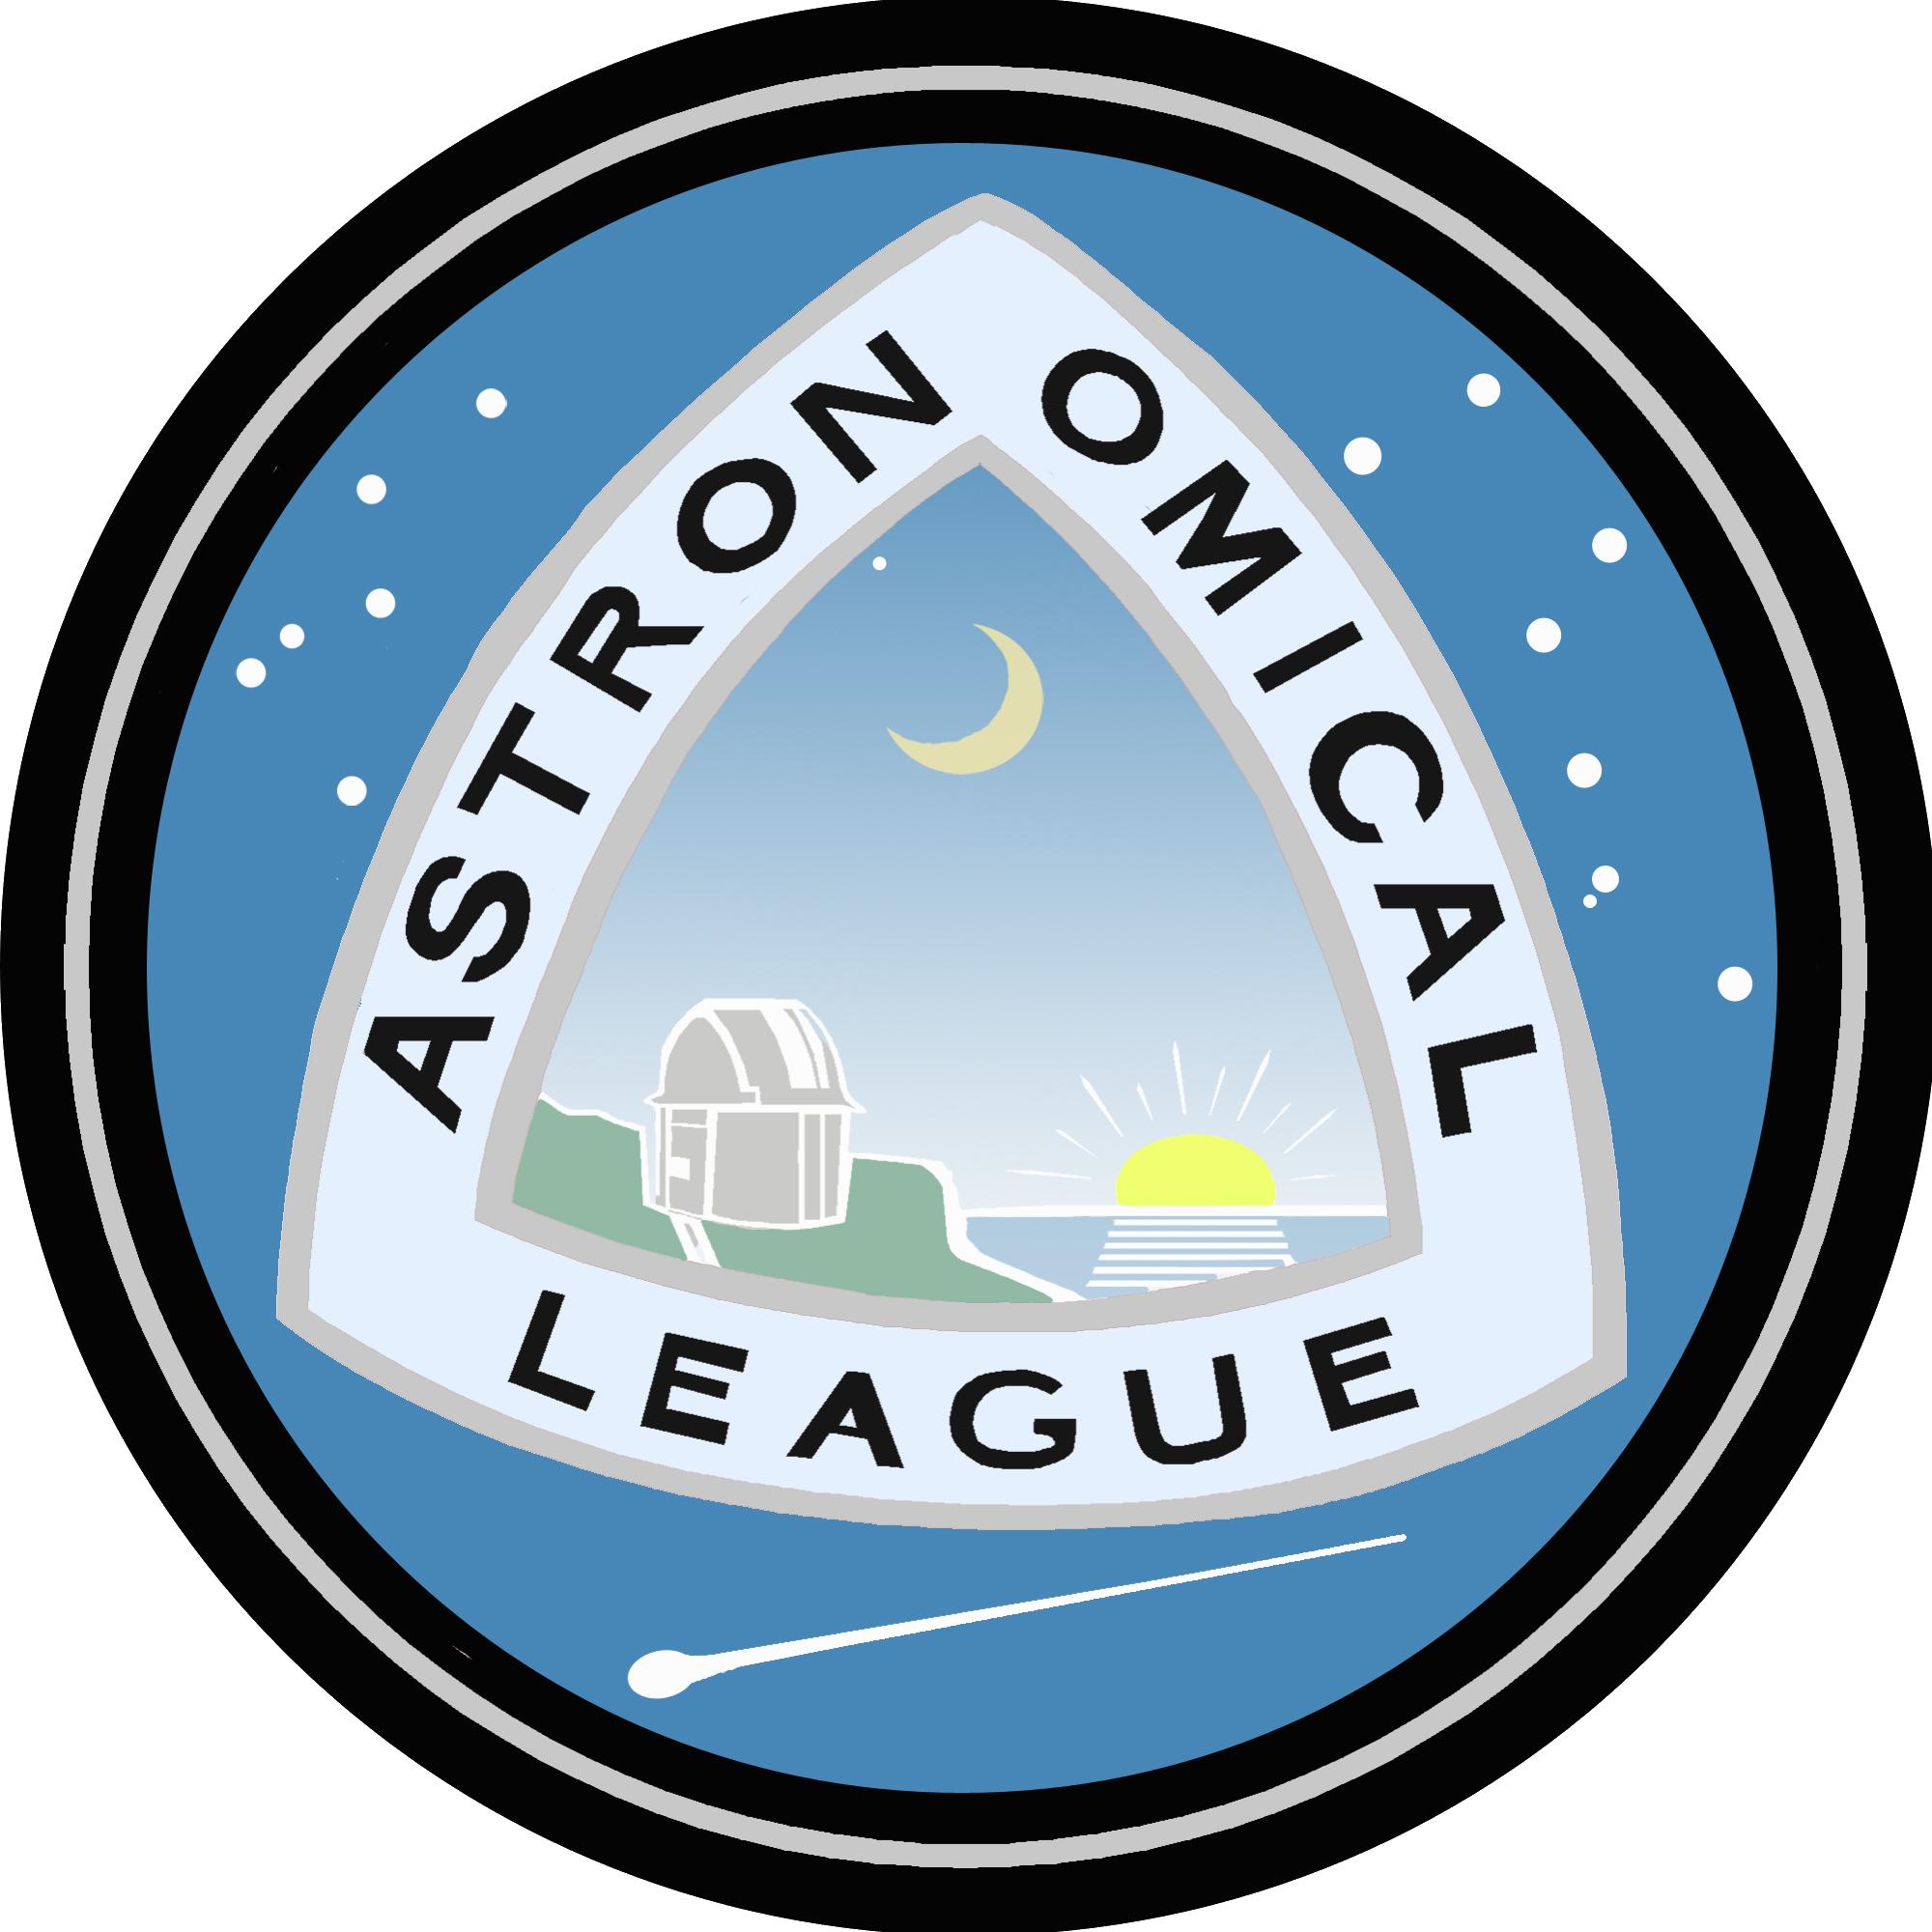 Astronomy clipart observer. Astronomical league